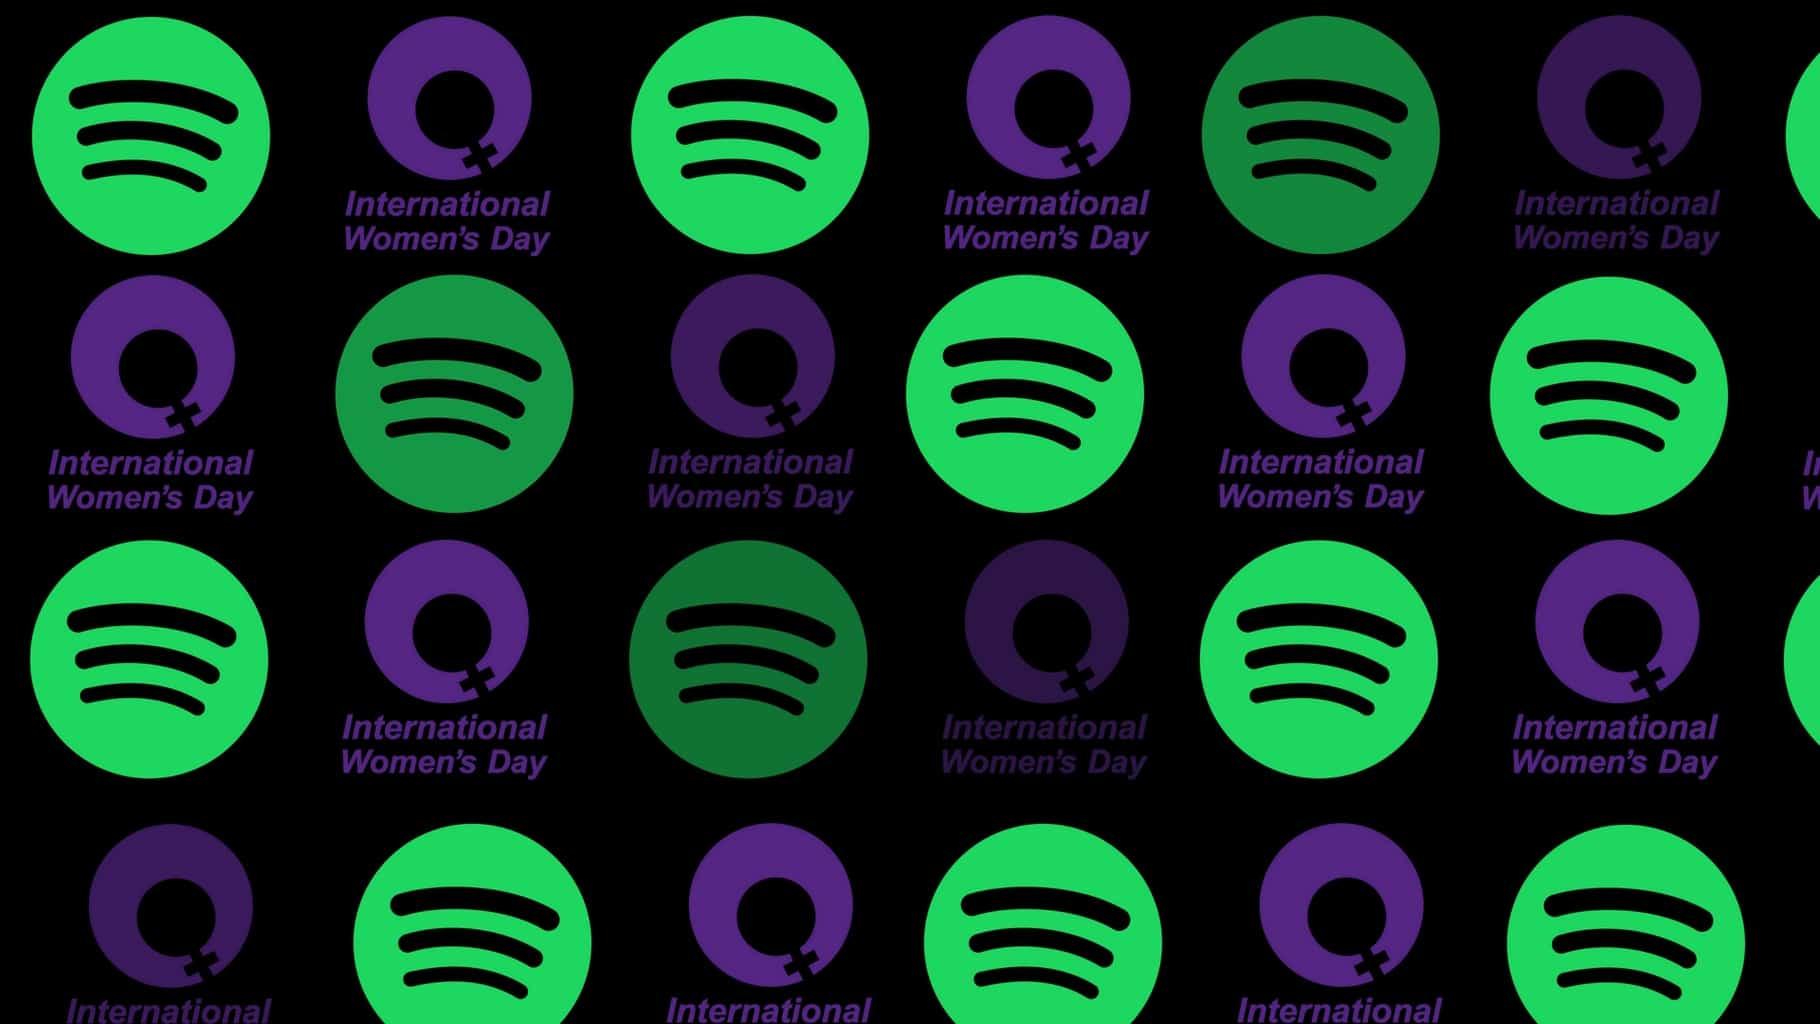 Spotify International Women's Day